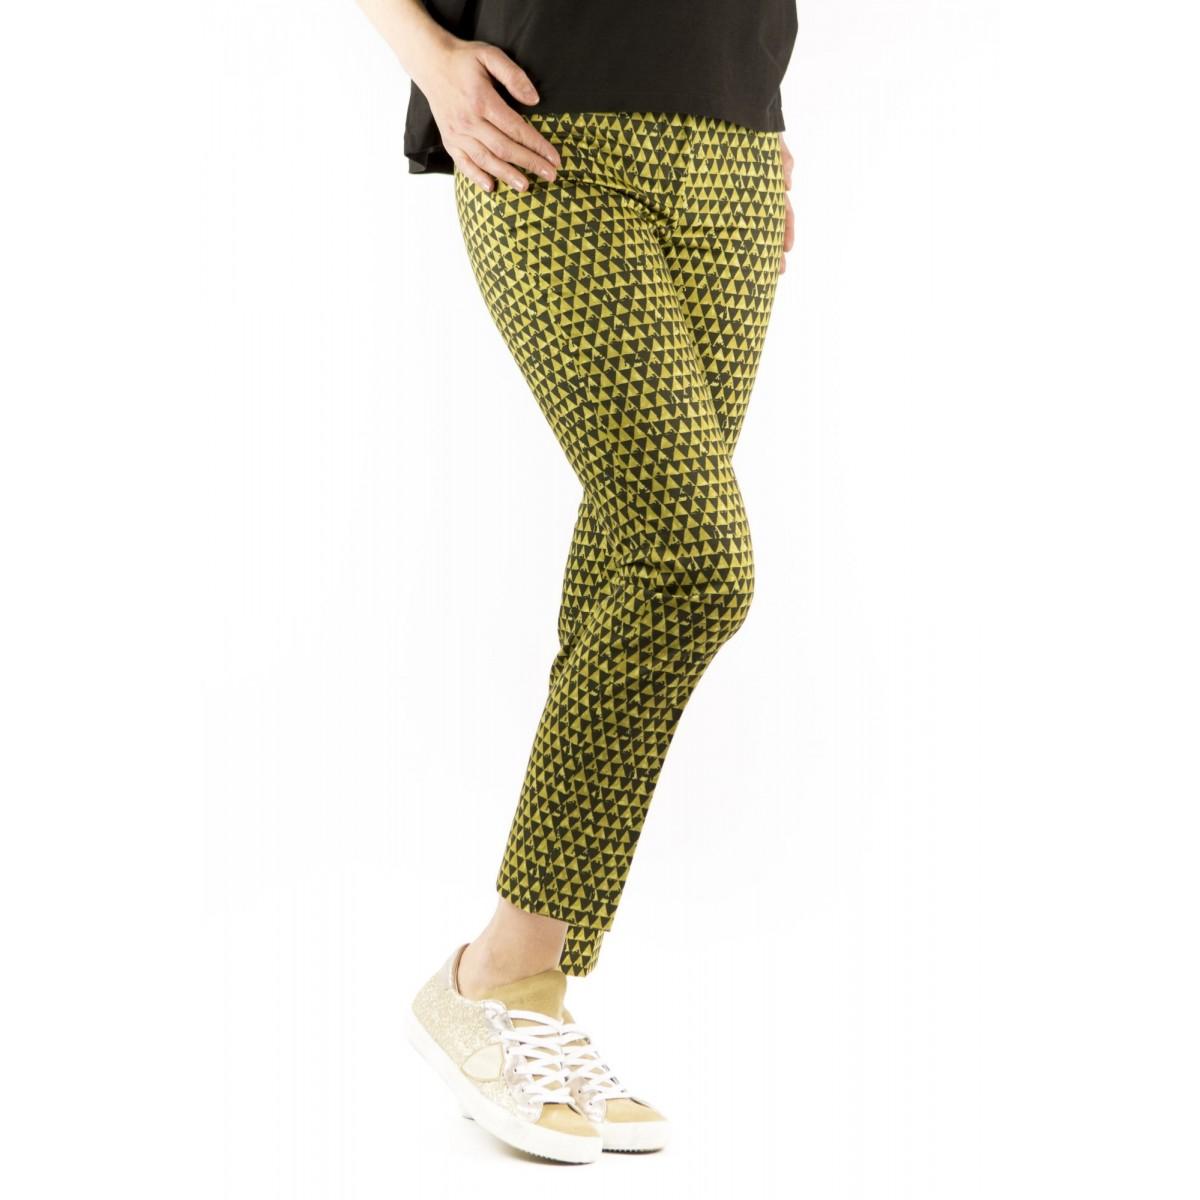 Pantalone Incotex Donna - 171522 Debora D6190 Pant Fantasia Geometrica